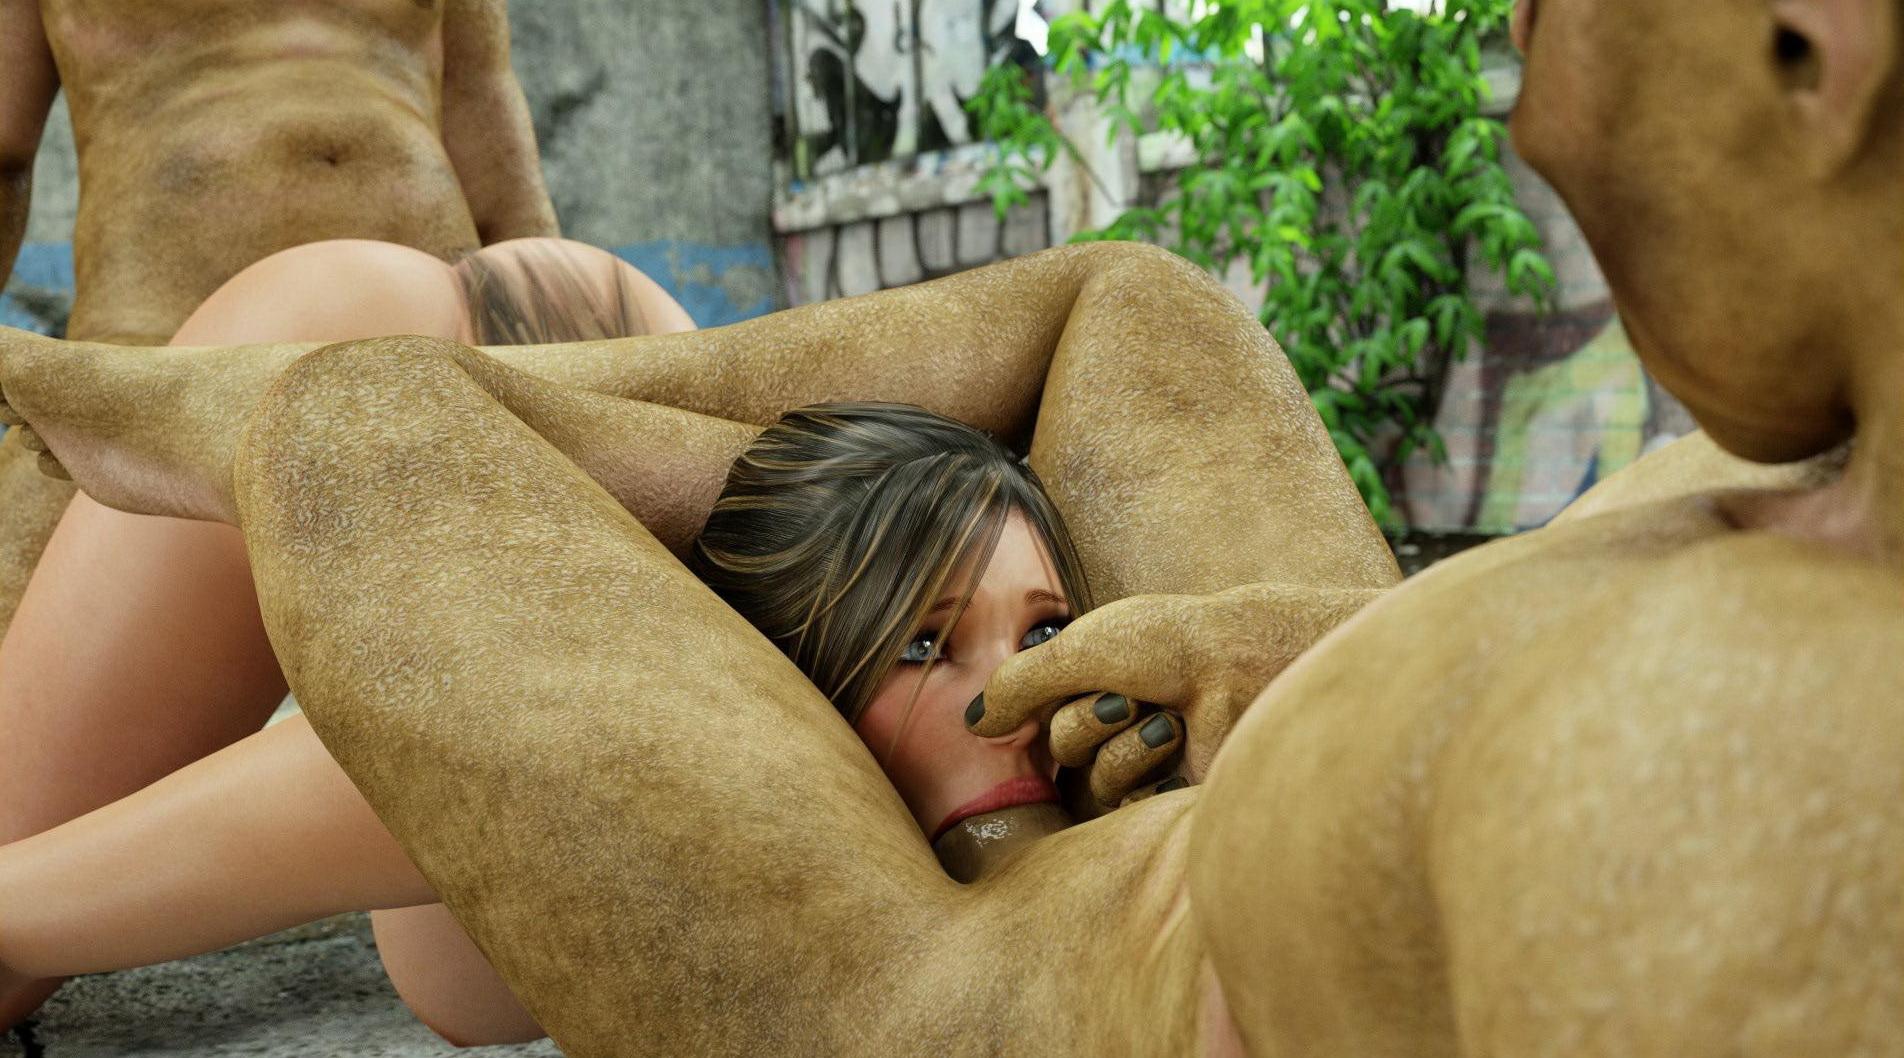 nude undressing amature undressing